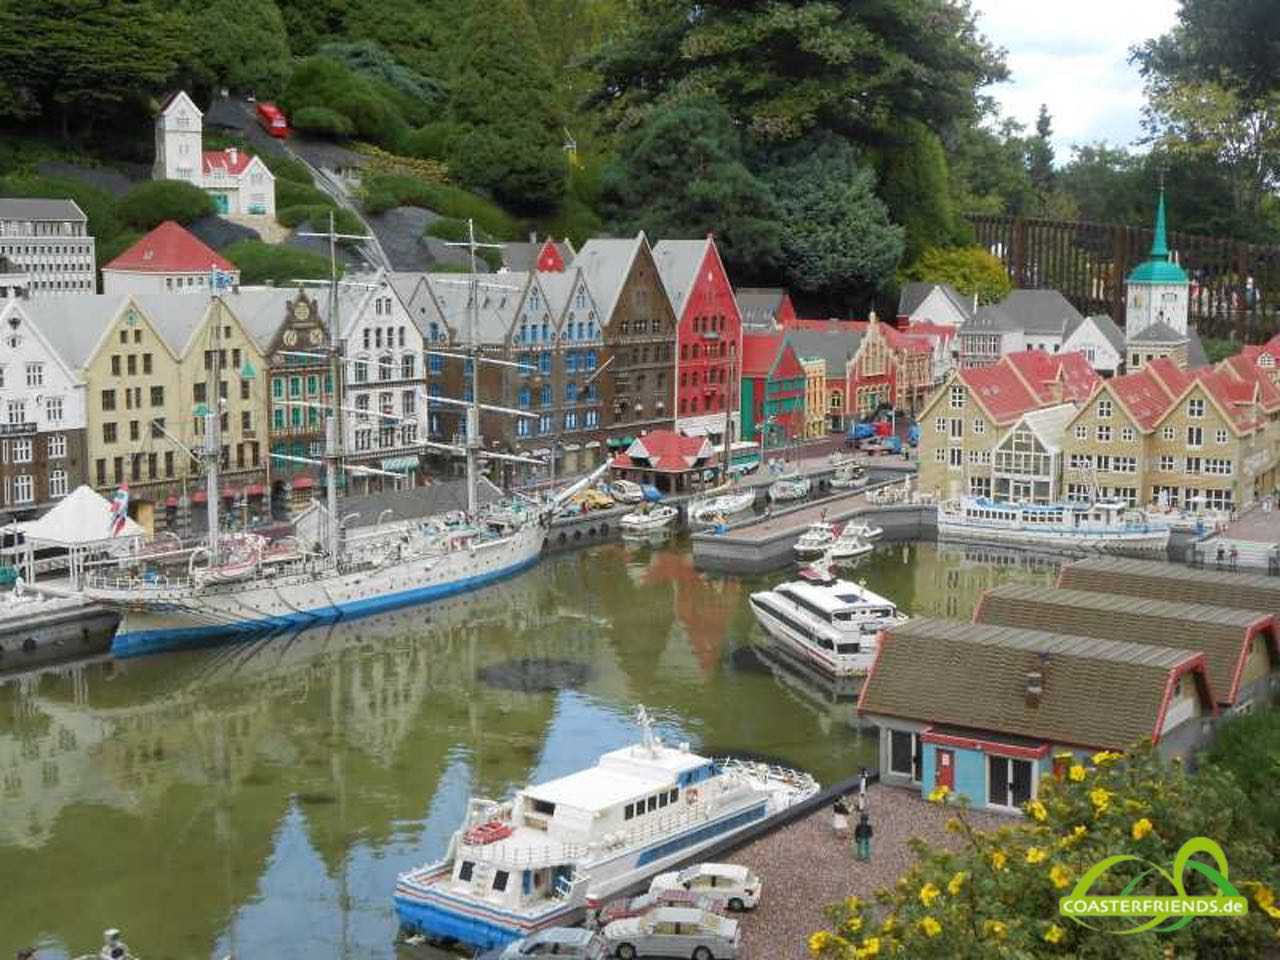 Europa - https://coasterfriends.de/joomla//images/pcp_parkdetails/europa/o1597_Legoland_Billund/content2.jpg